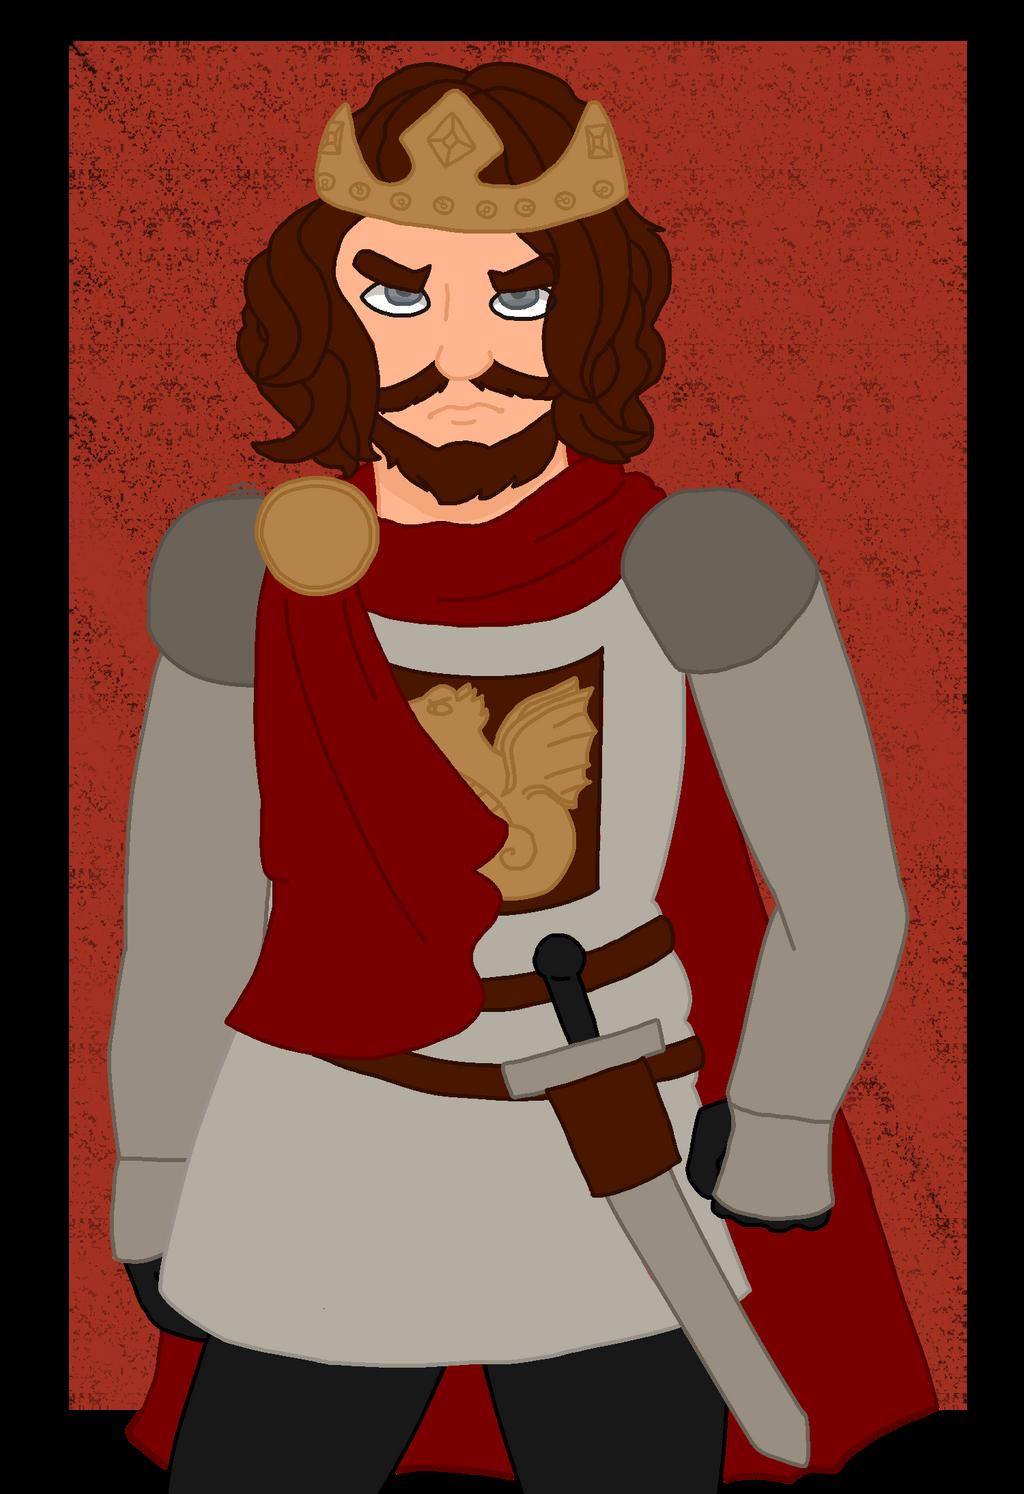 King Arthur by CyclopsBurger